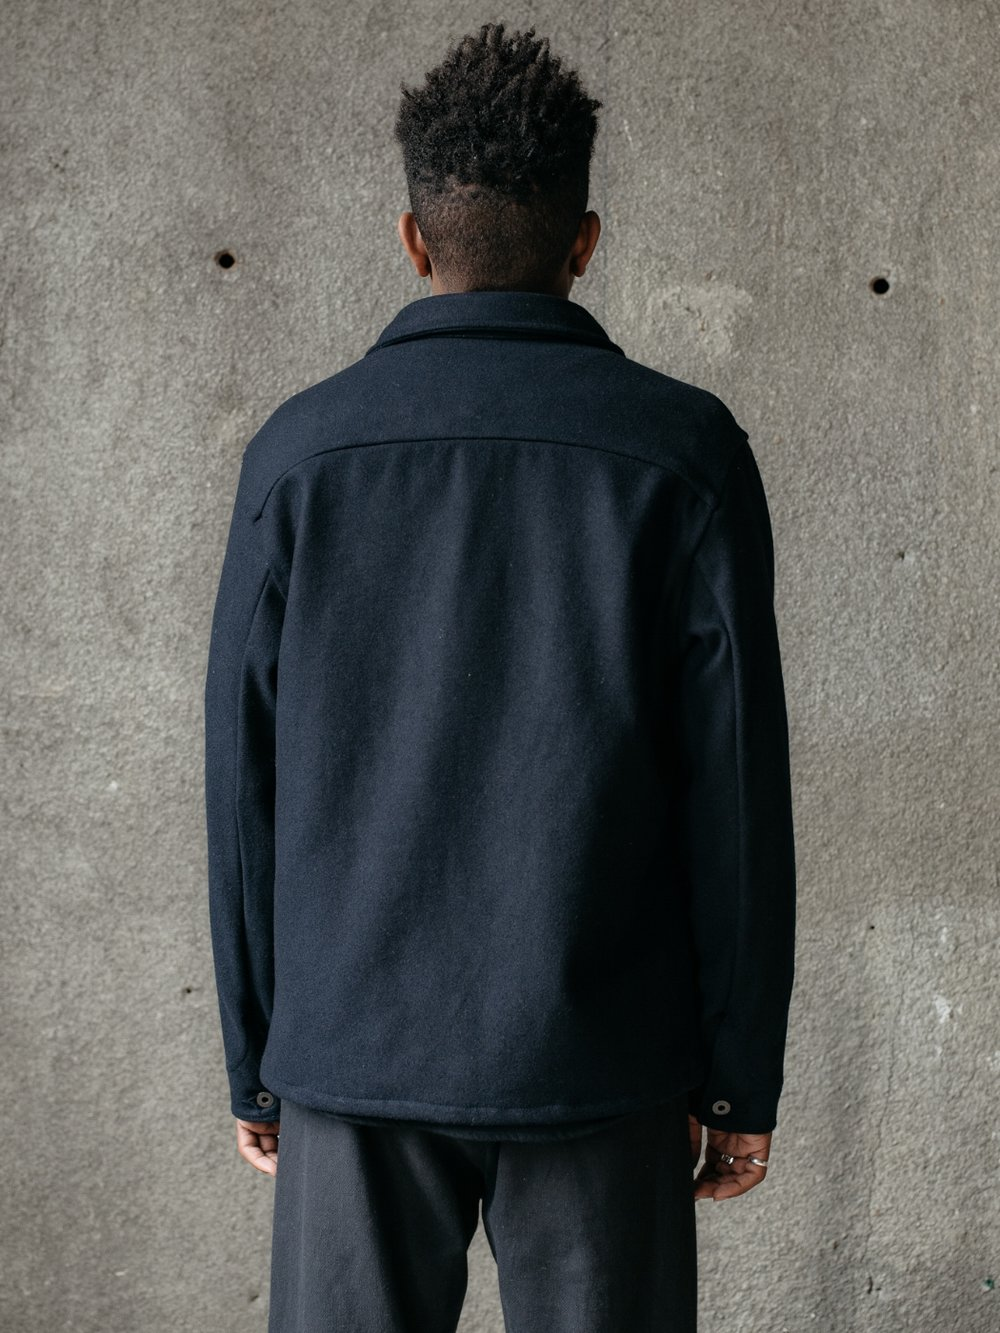 evan-kinori-three-pocket-jacket-melton-wool-fall-2017-2